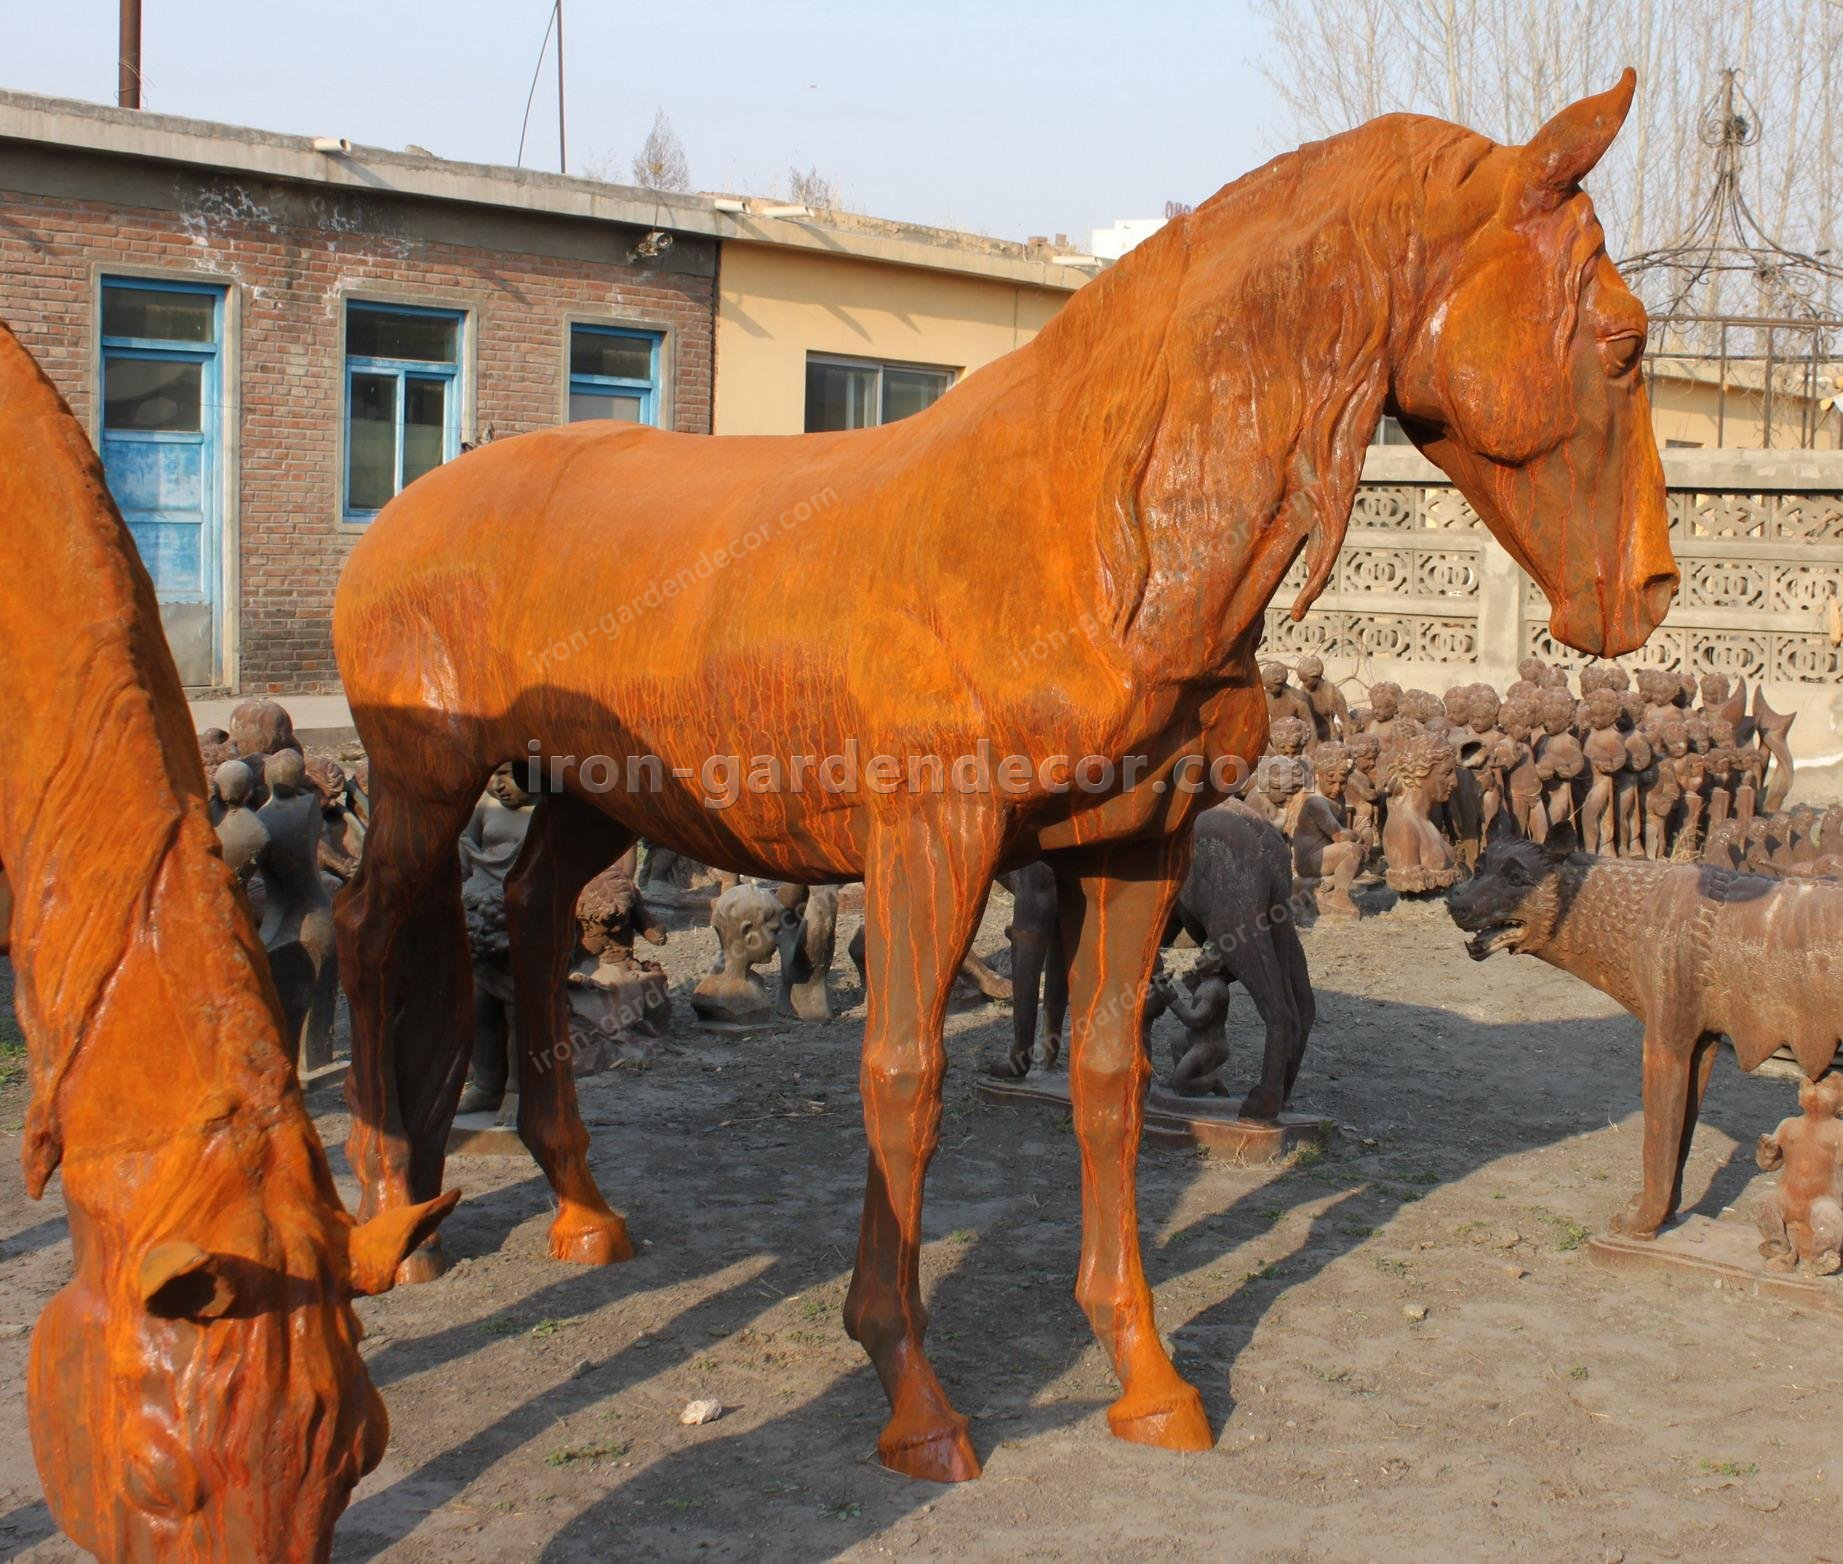 normal size cast iron animal of horse garden animal, large horse animal-G1275 (4)